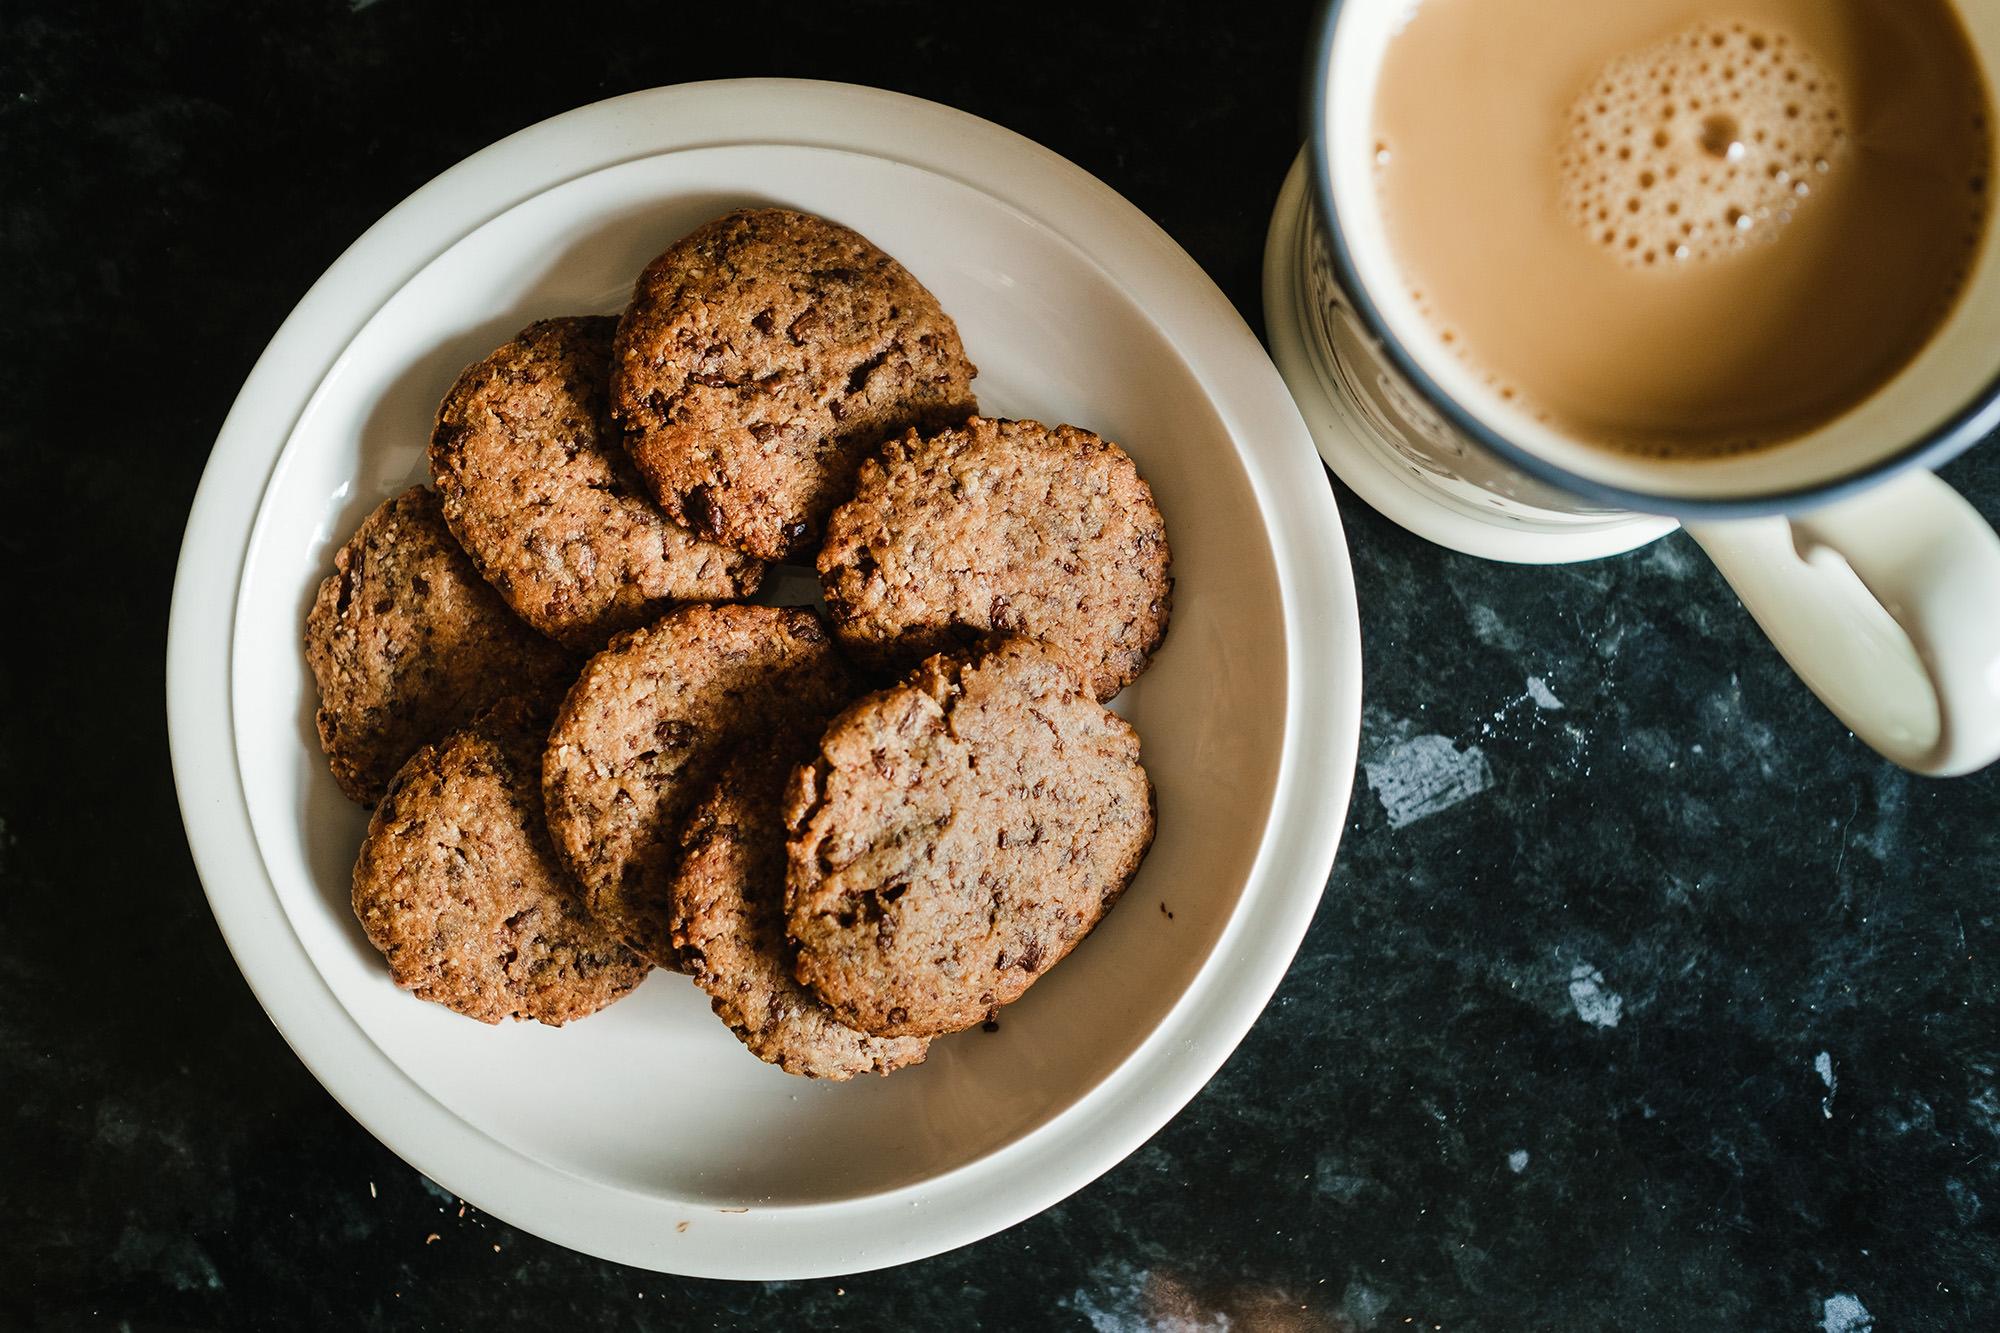 chocolate cookies made